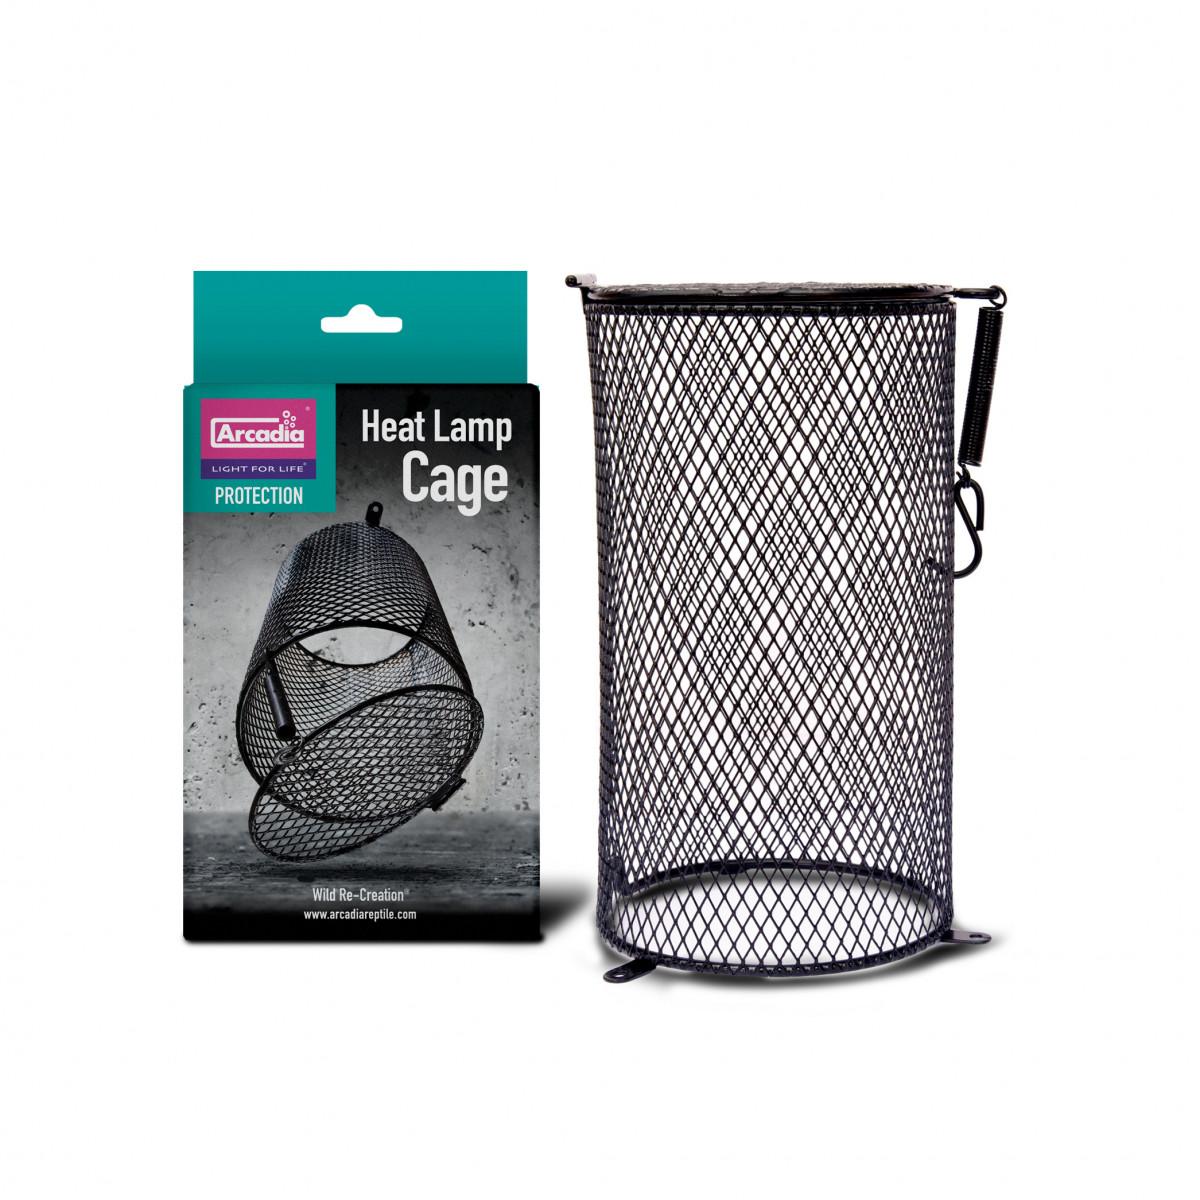 Arcadia Heat Lamp Cage, 120mm d